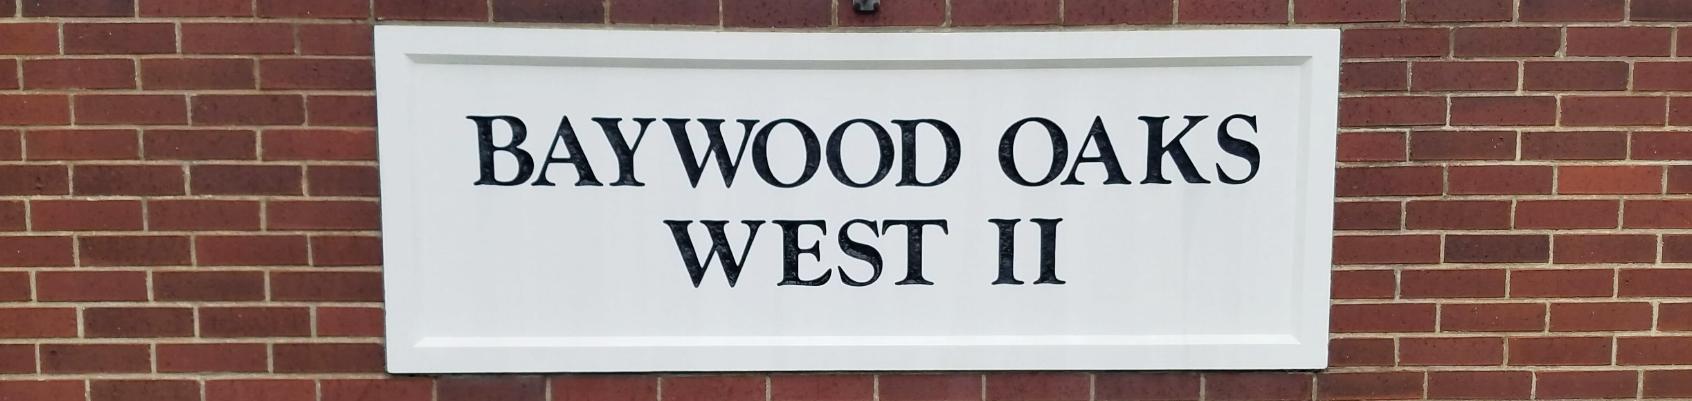 67_Baywood Oaks West II.jpg